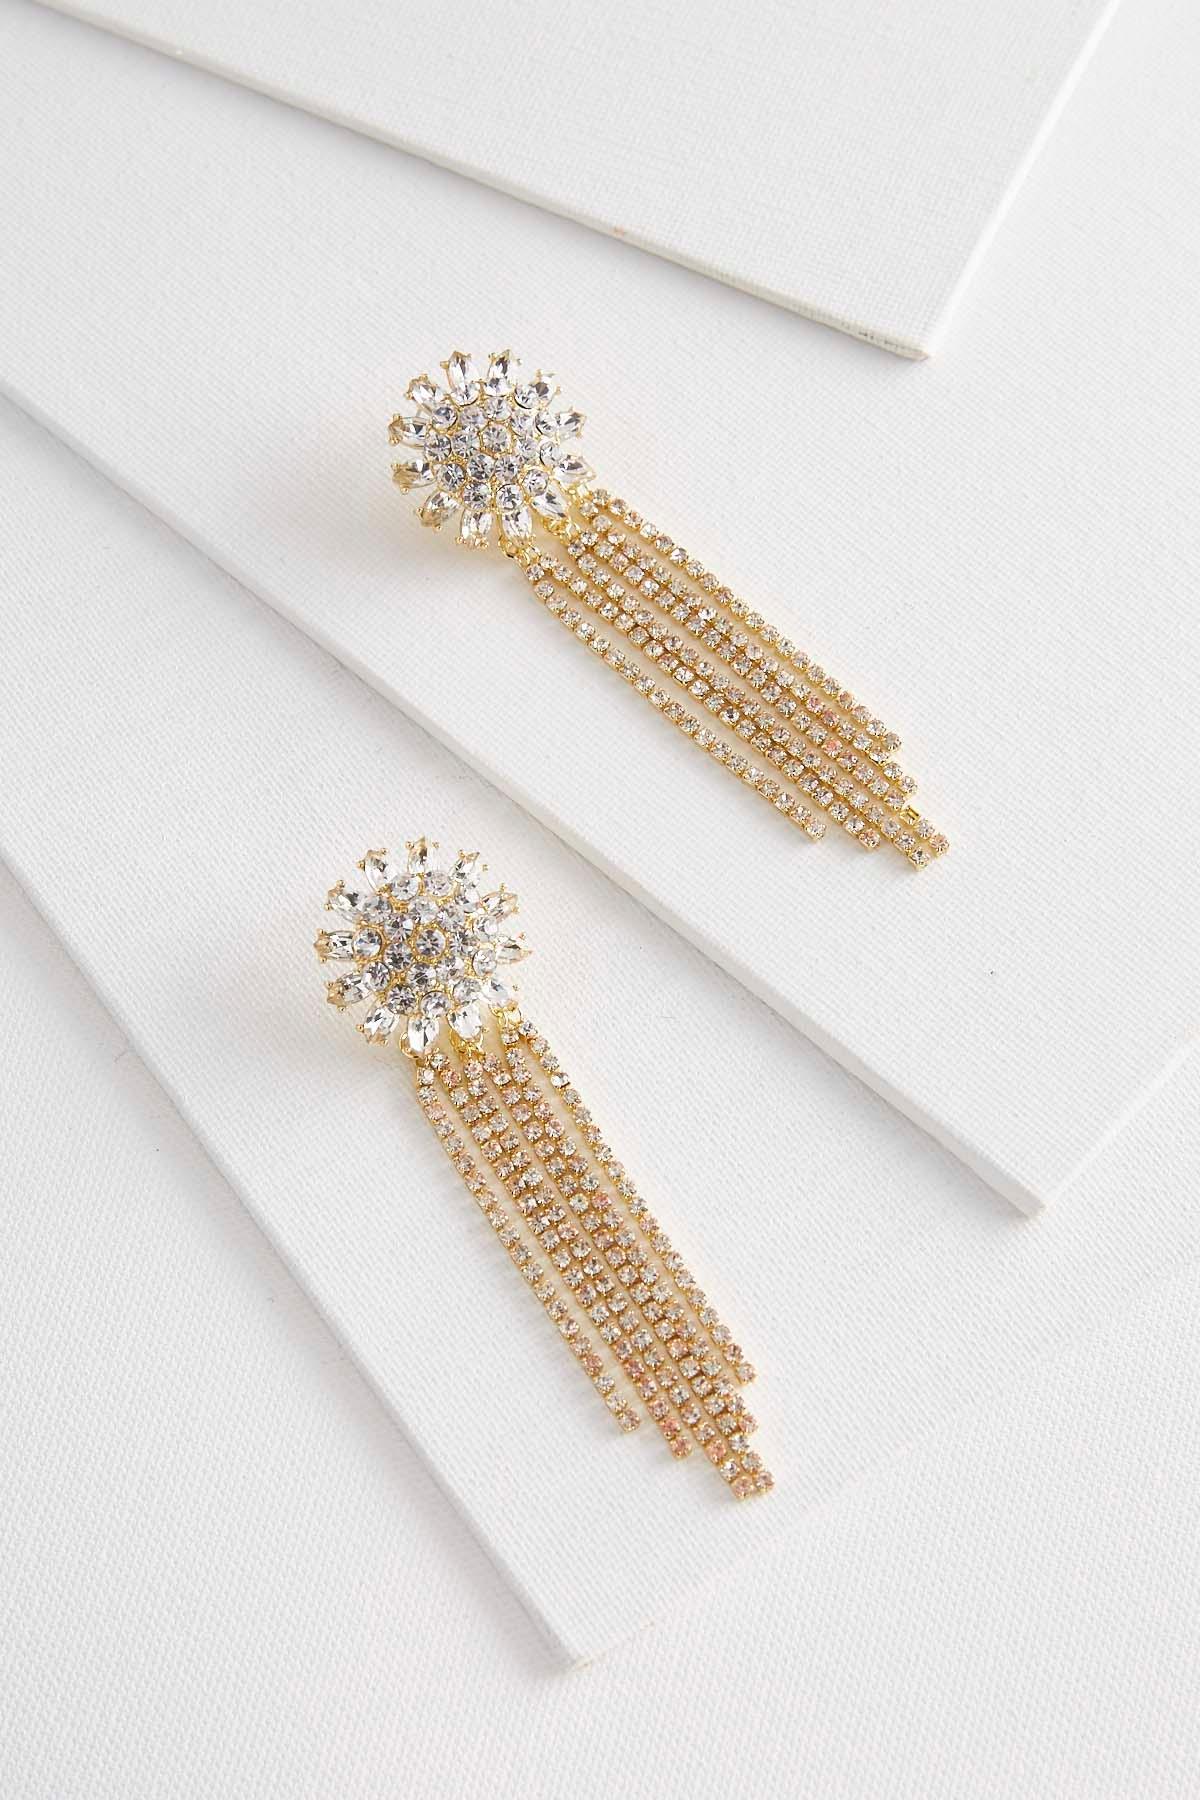 Rhinestone Floral Statement Earrings